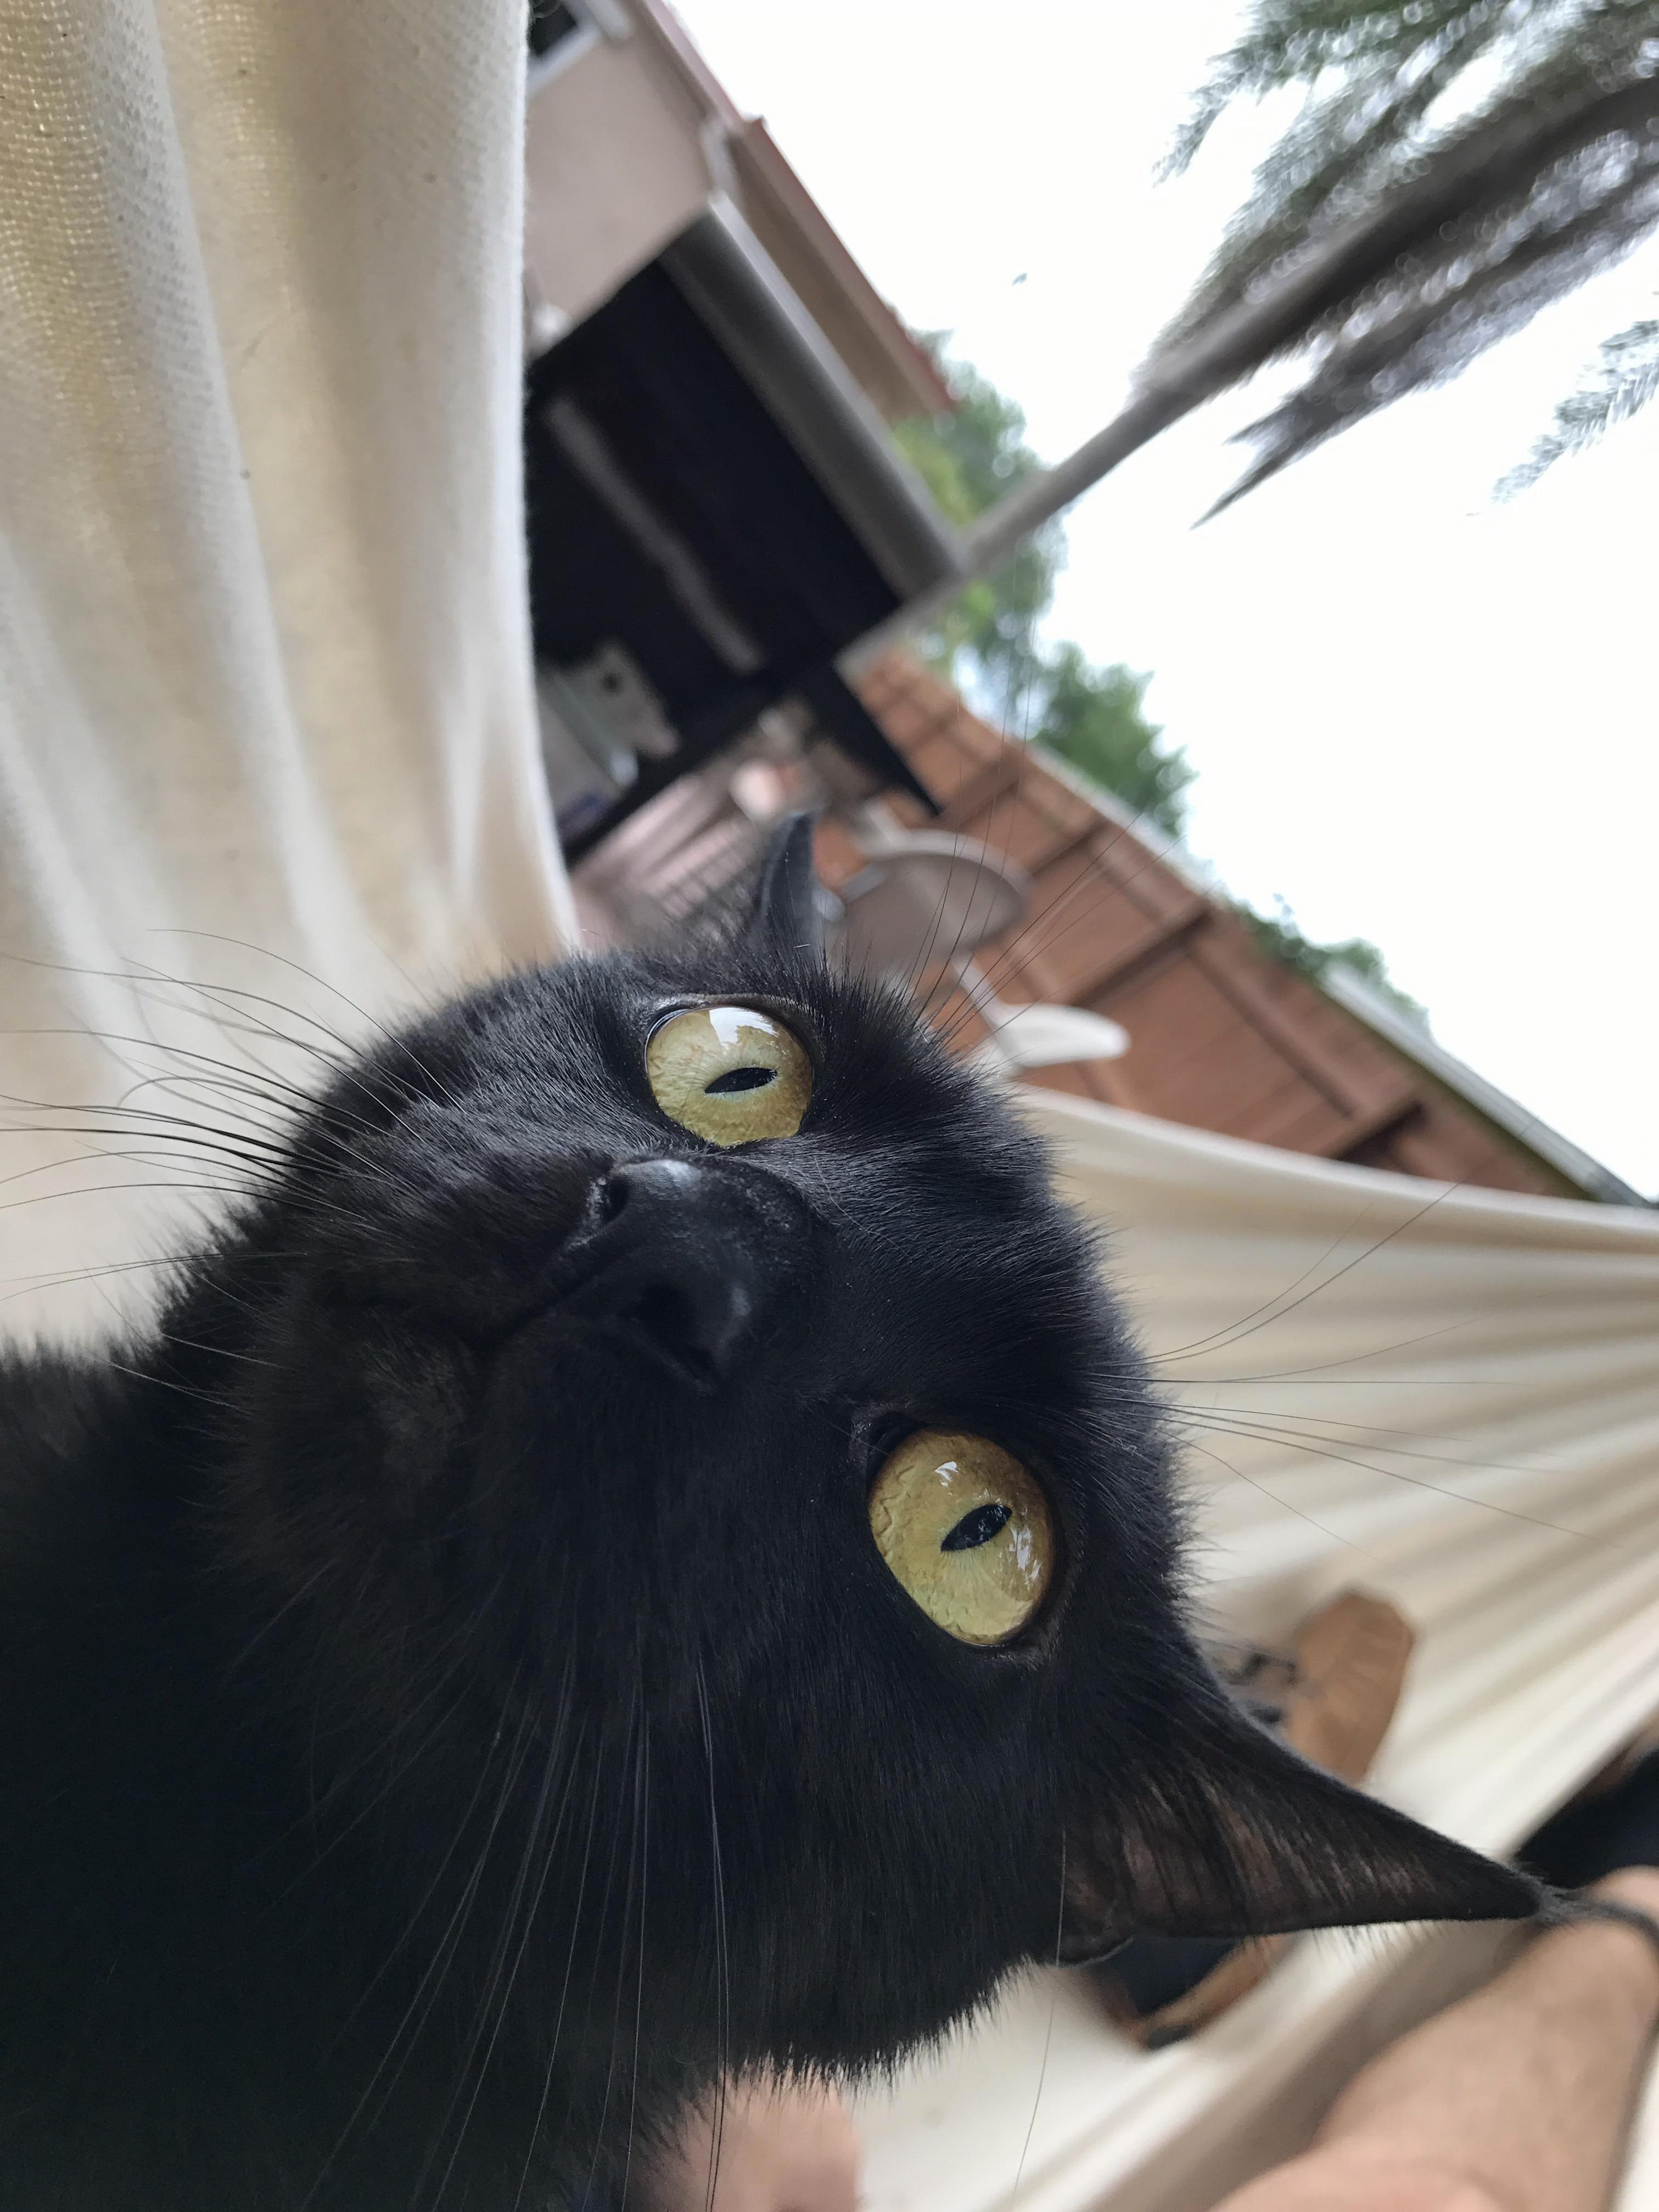 He loves hammocks